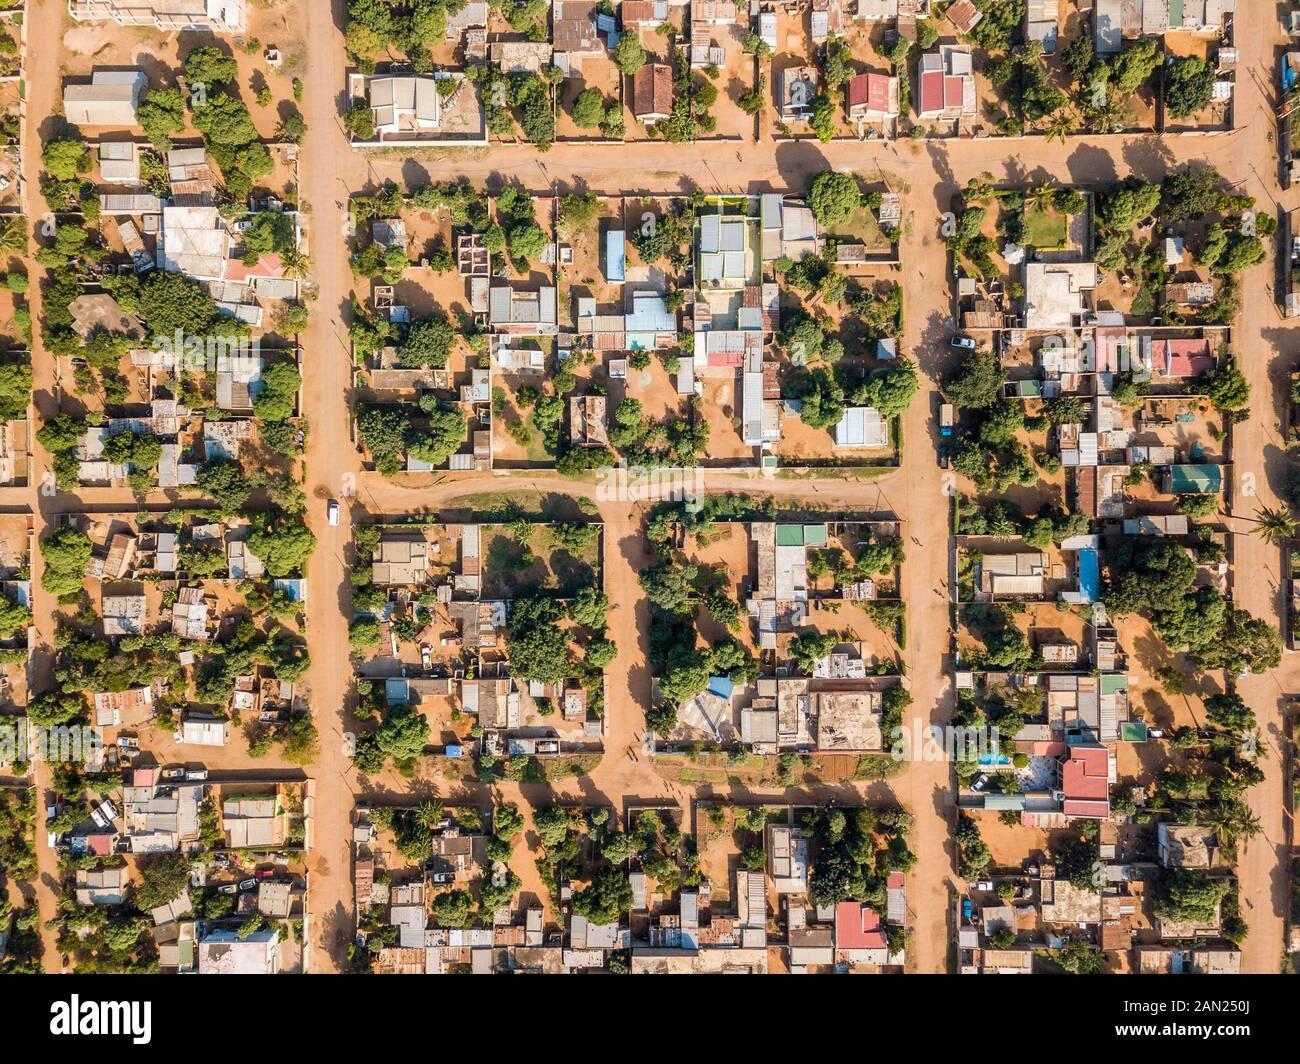 Aerial view of Matola, suburbs of Maputo, Mozambique Stock Photo